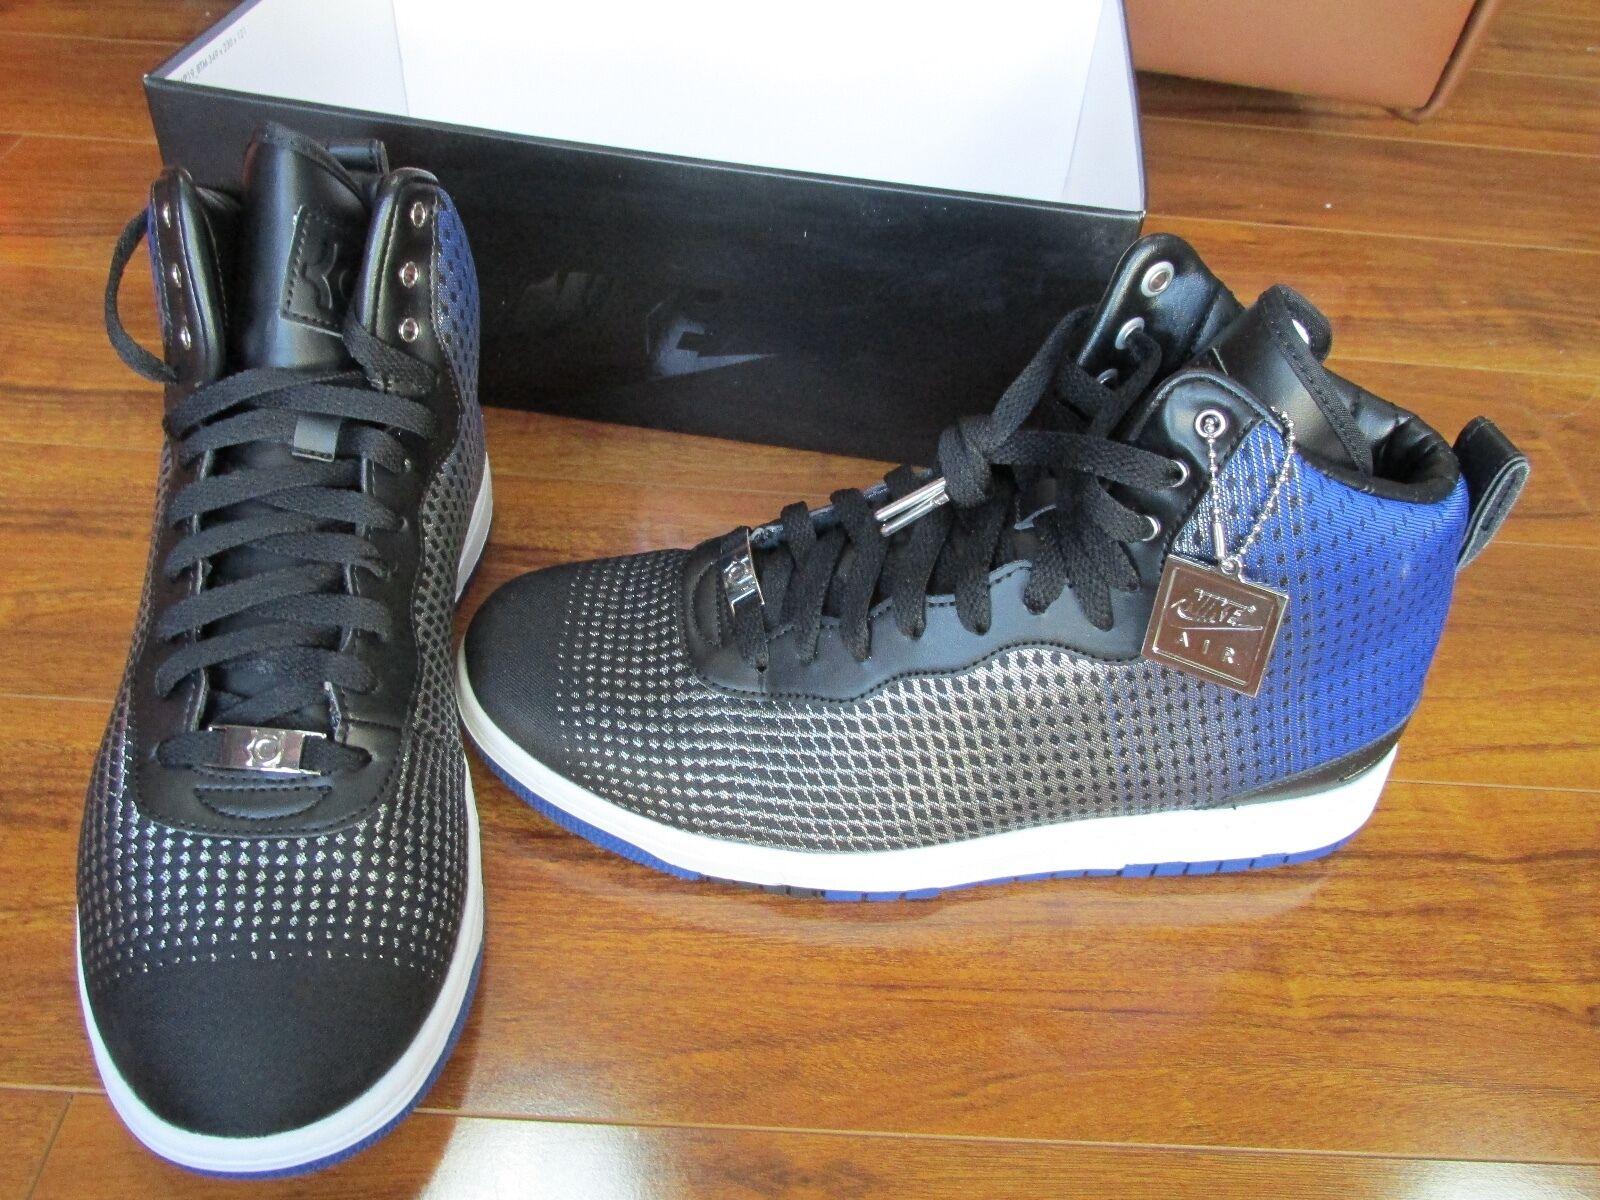 Ny Nike KD VIII NSW Livsstil skor skor MENS 9 blå silver 749637 400  140